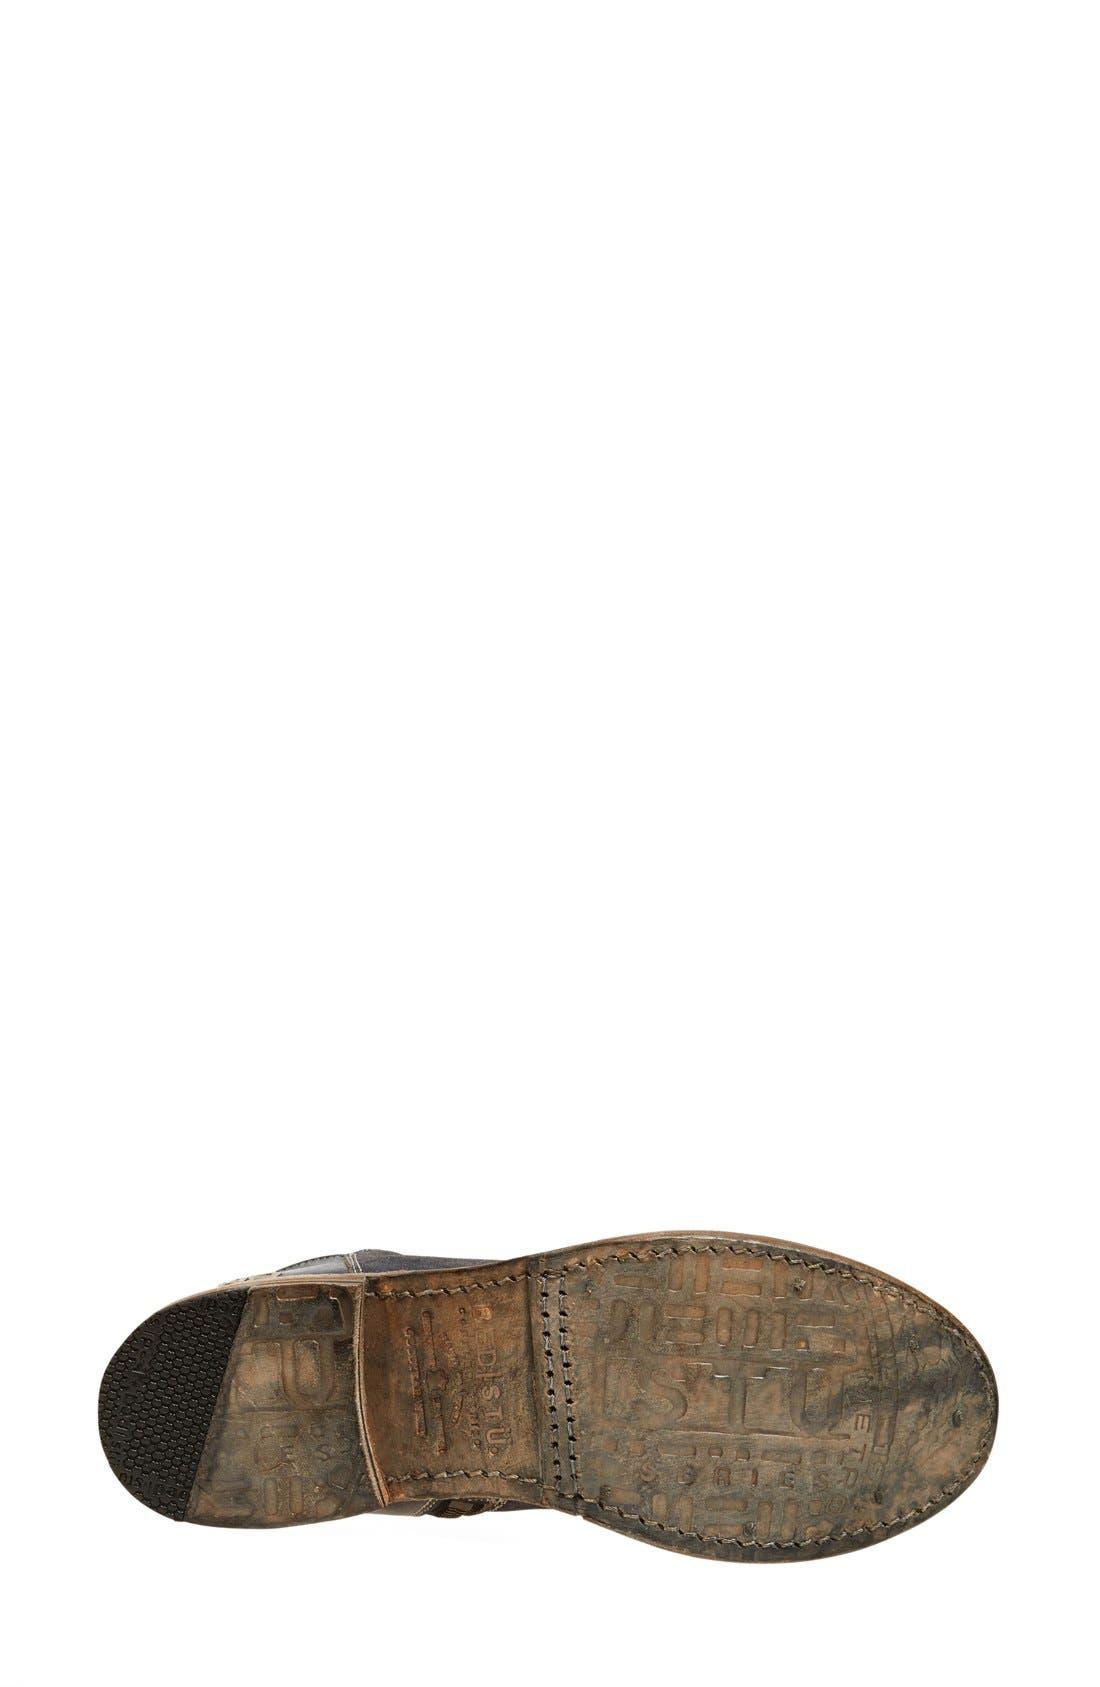 Alternate Image 4  - Bed Stu 'Cambridge' Knee High Leather Boot (Women)